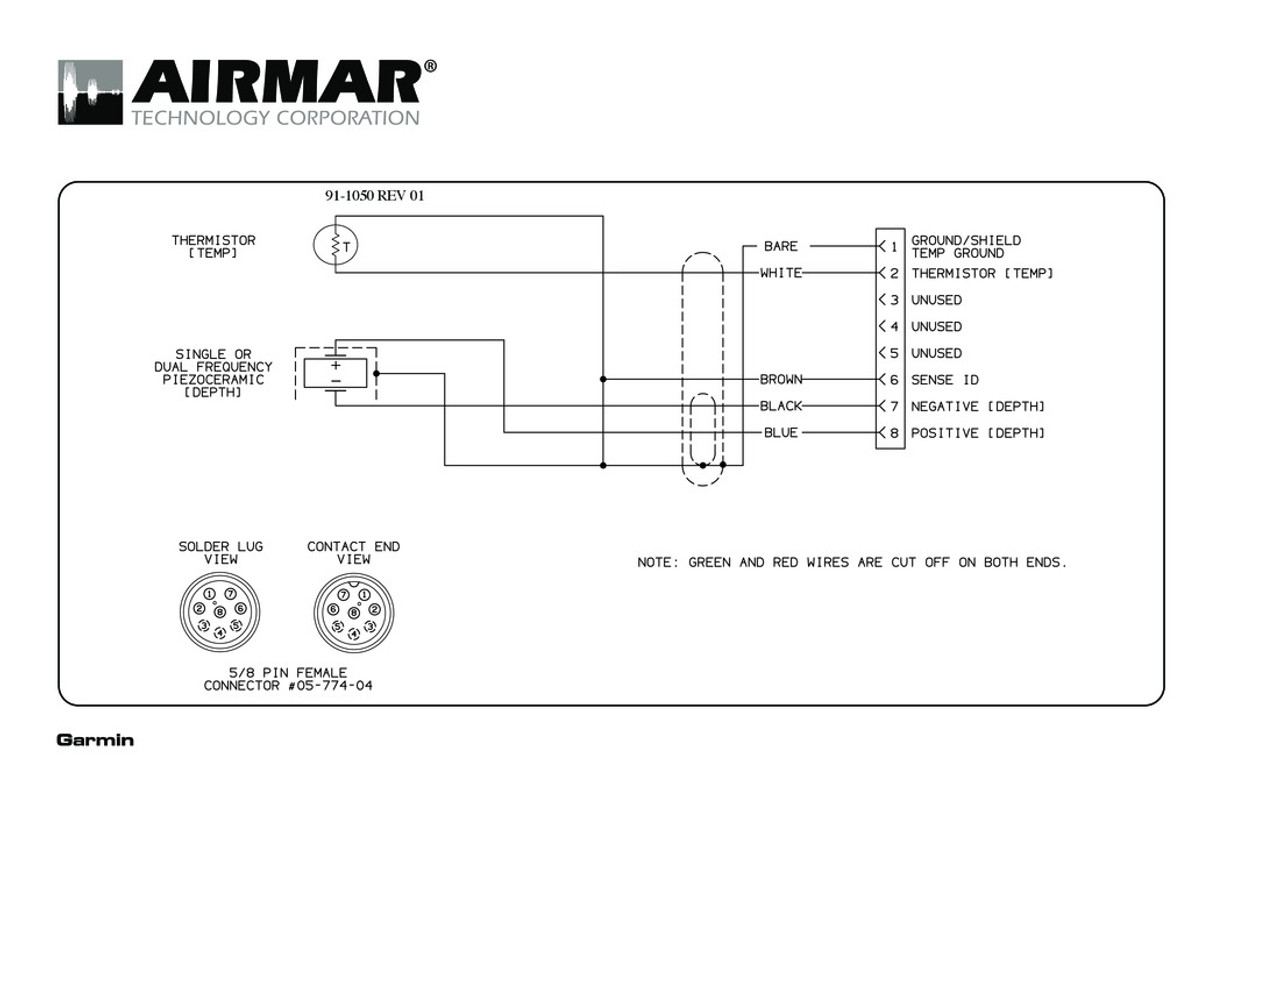 hight resolution of airmar wiring diagram garmin p319 8 pin d t blue bottle marine garmin marine gps wiring diagram garmin marine wiring diagram